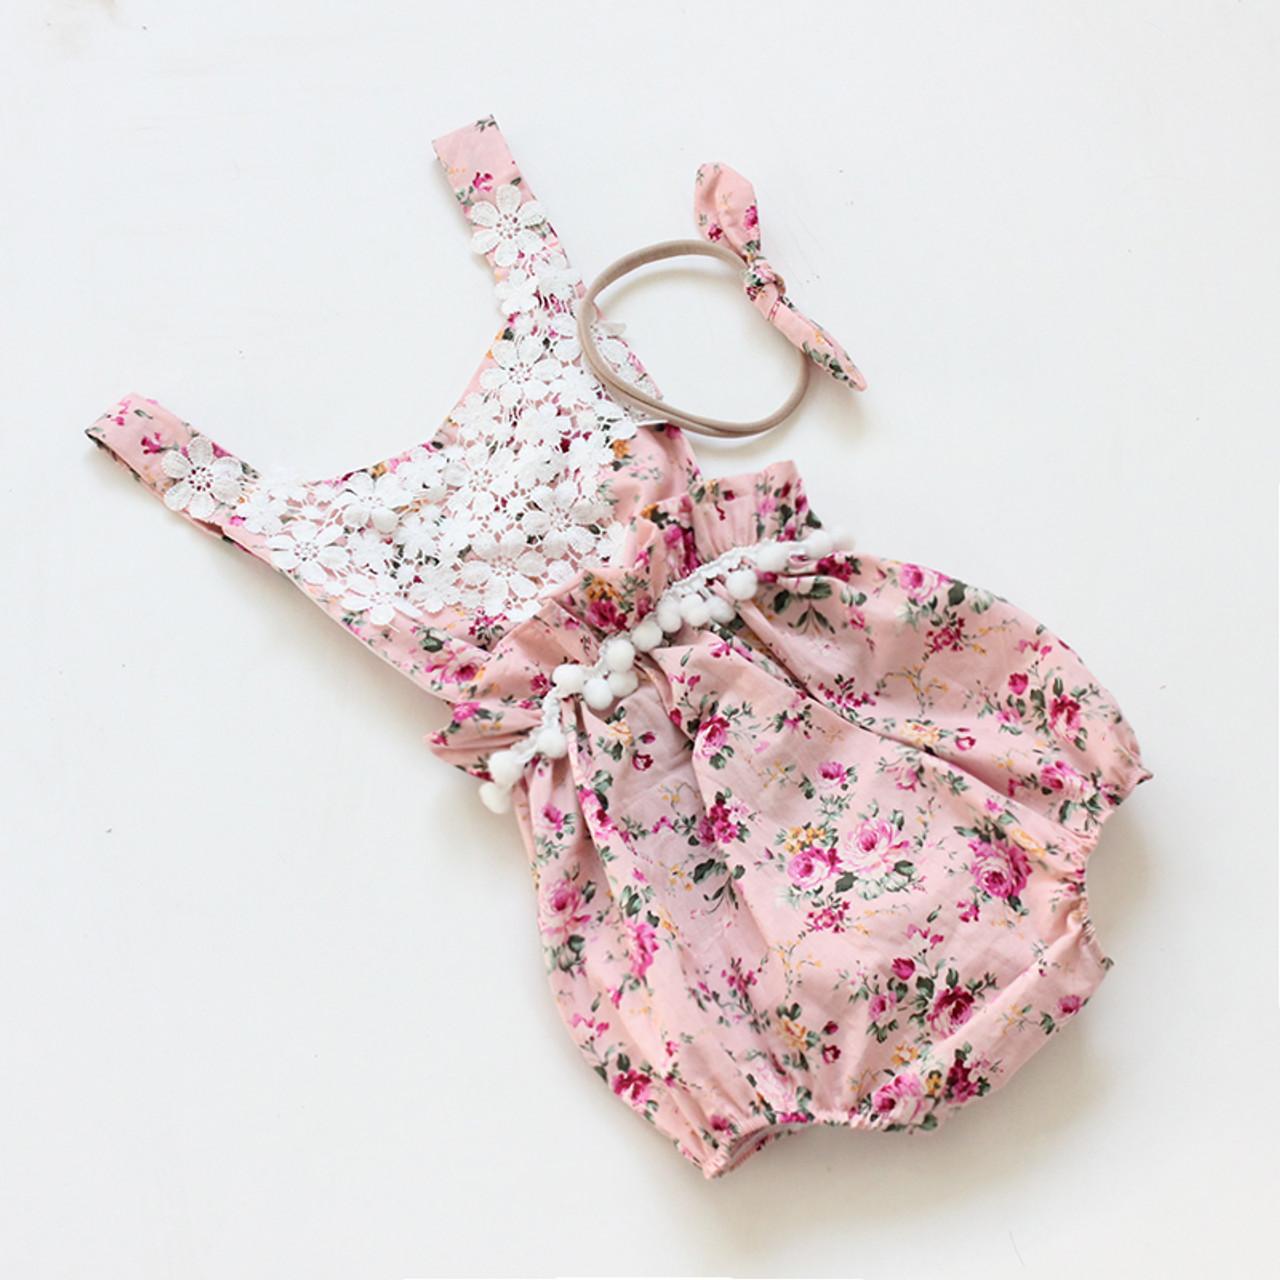 2017 Direct Selling New Belt Cute Baby Rompers Summer Ruffled Flower Girl Costum